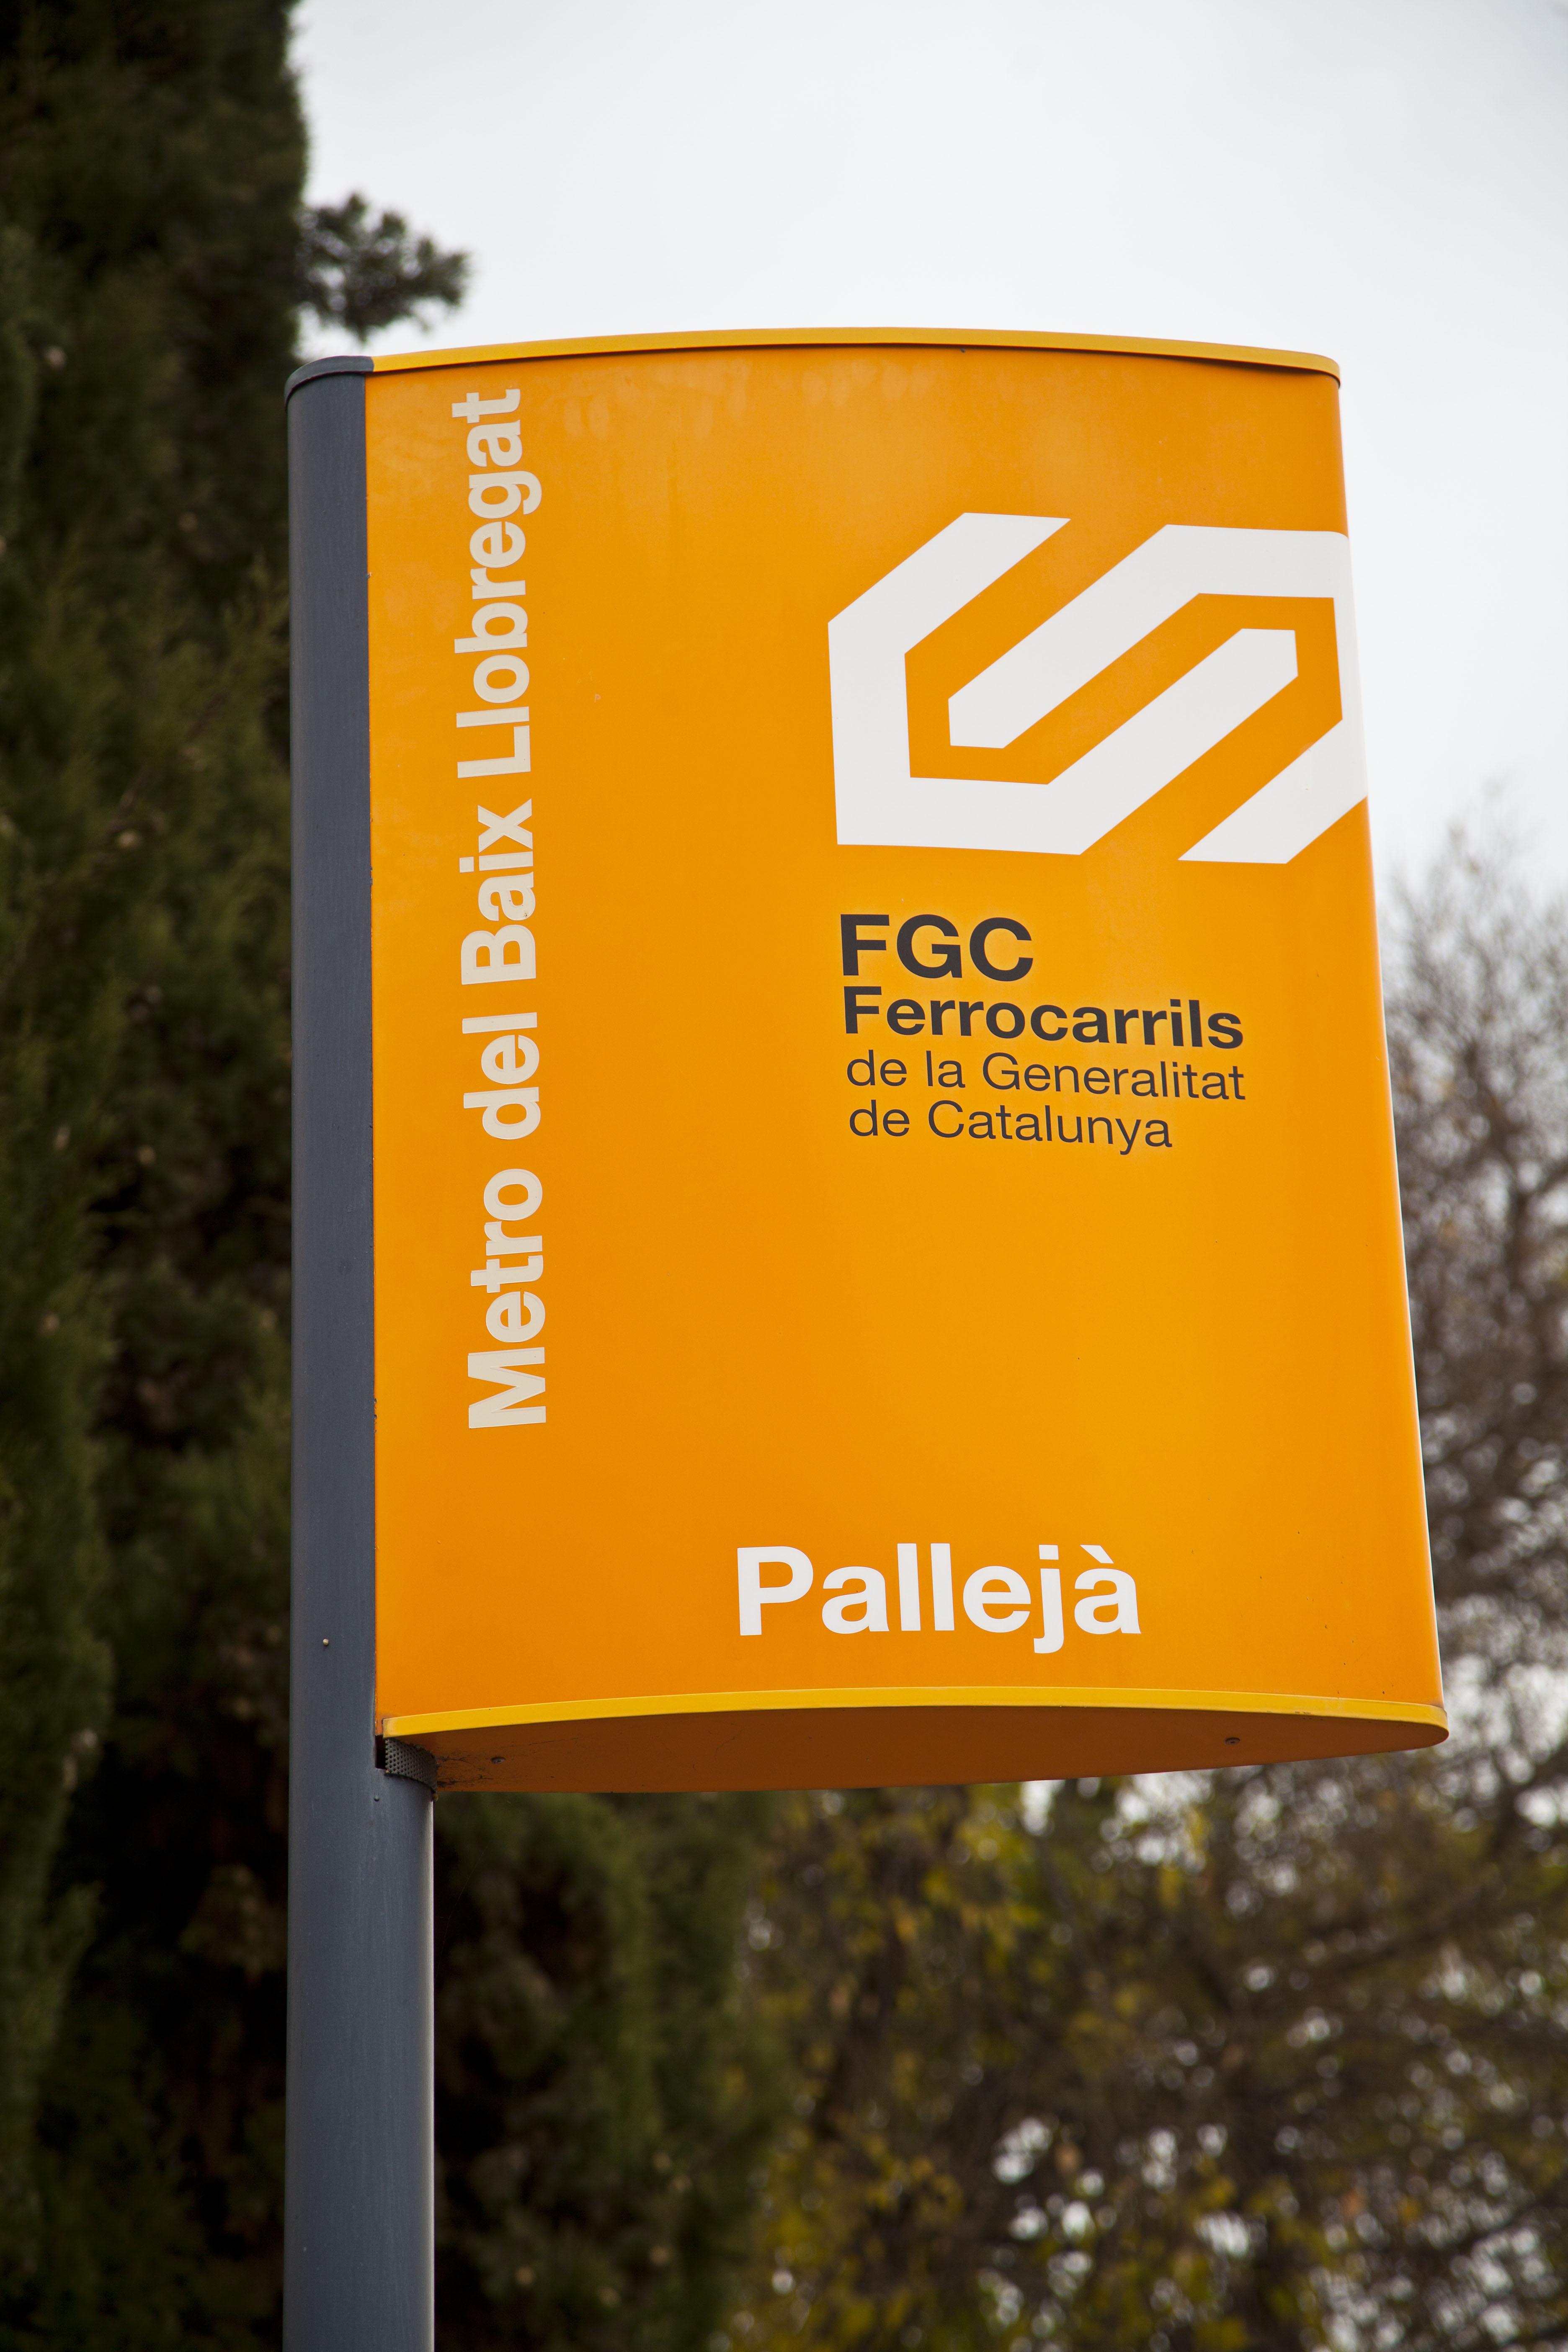 PALLEJÀ- FGC